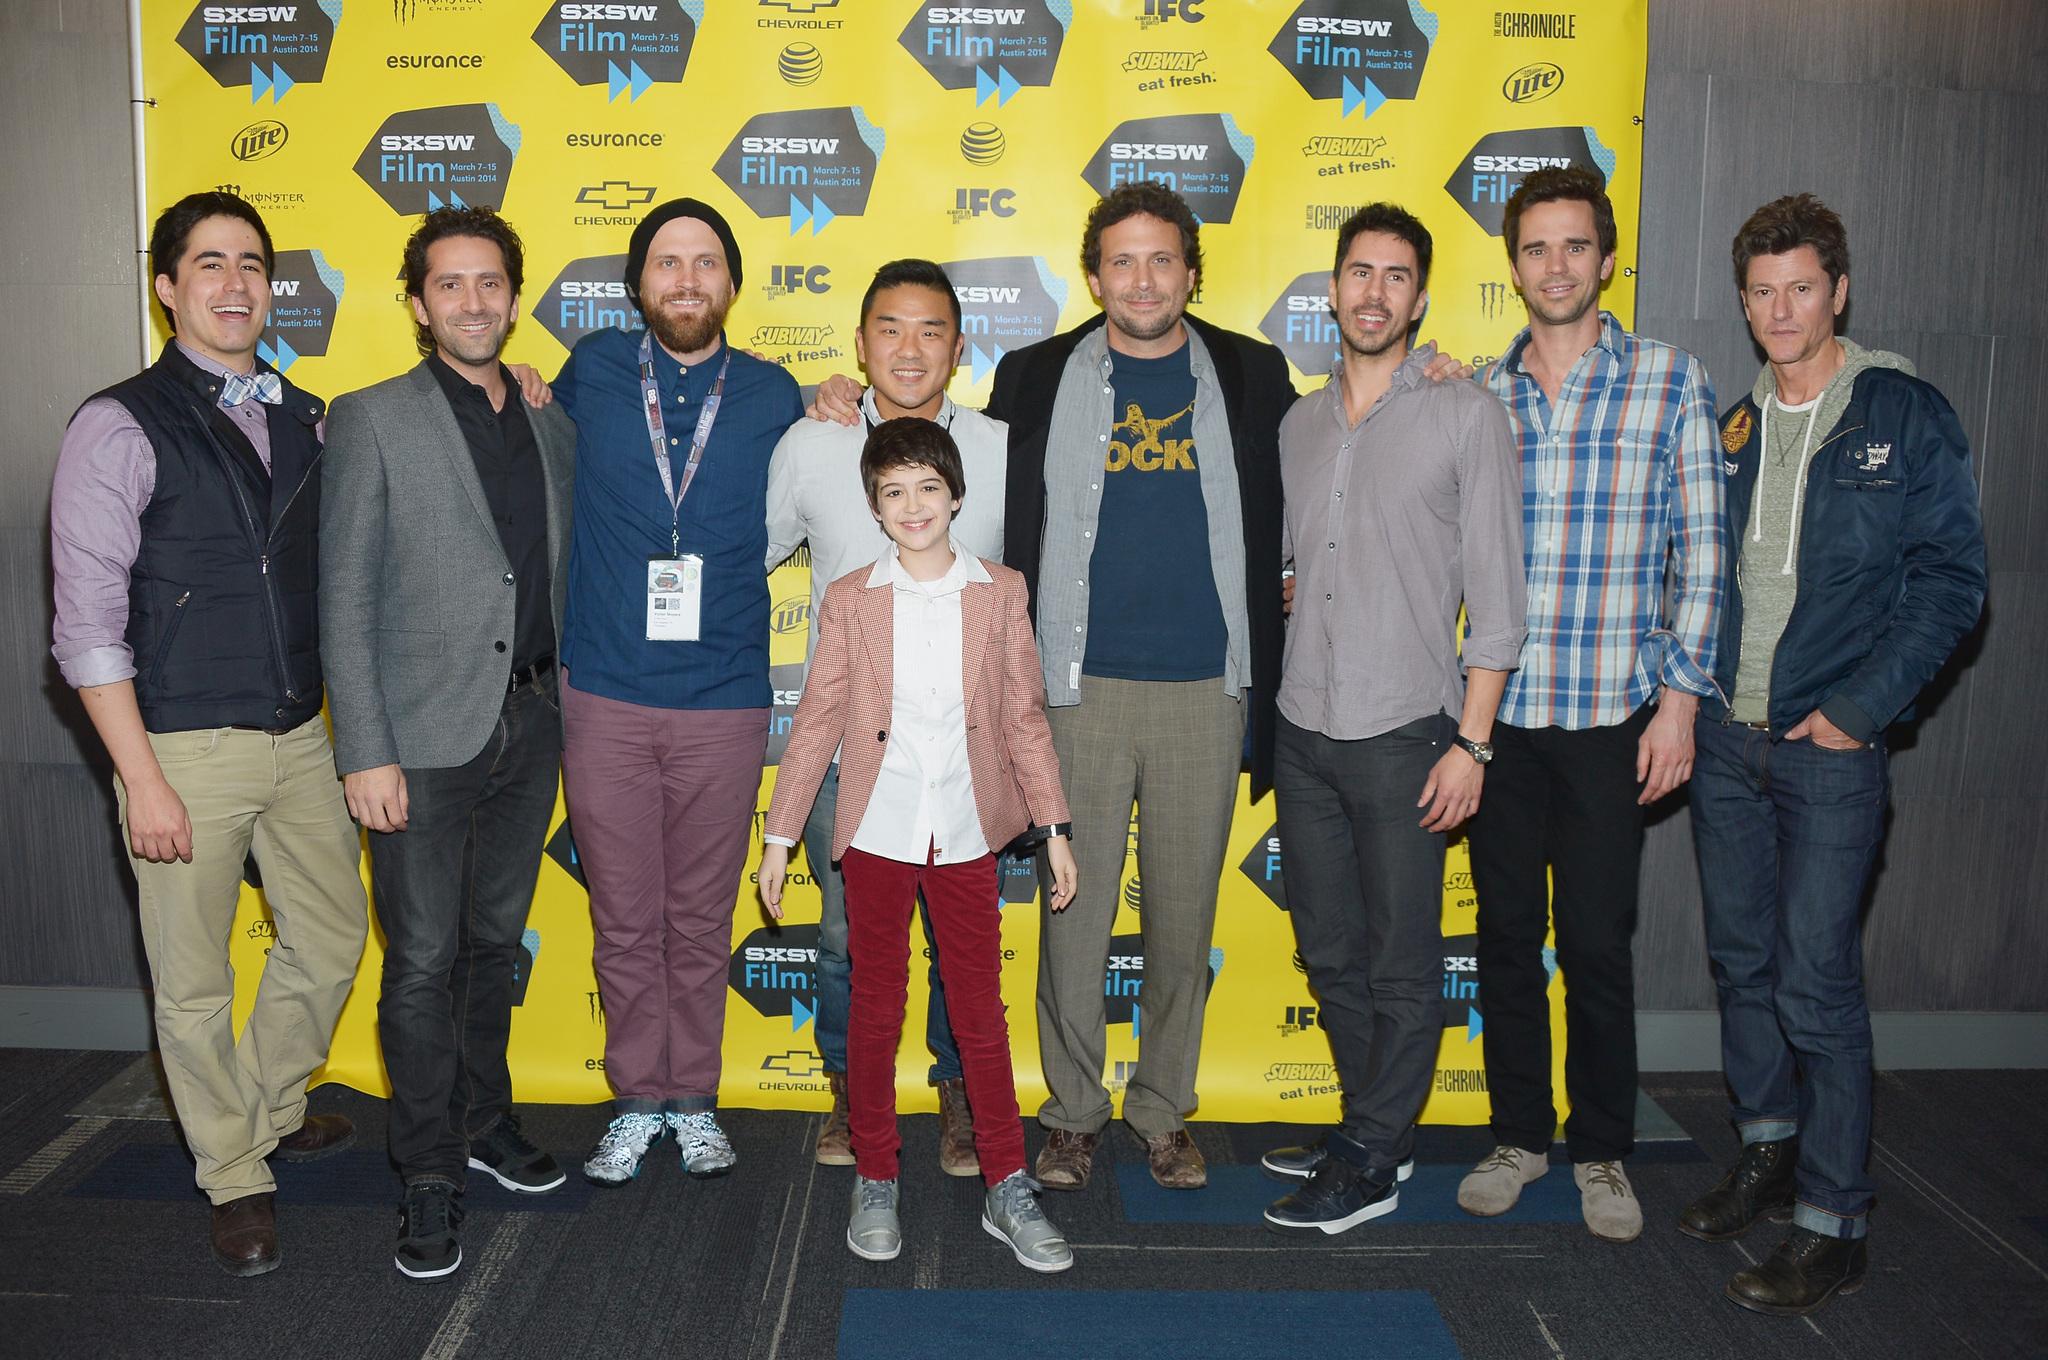 Jeremy Sisto, Vincent Ventresca, Jay Karas, David Walton, Gene Hong, Victor Moyers, Joshua Rush, Gabriel Hammond and Daniel Hammond at event of Break Point (2014)